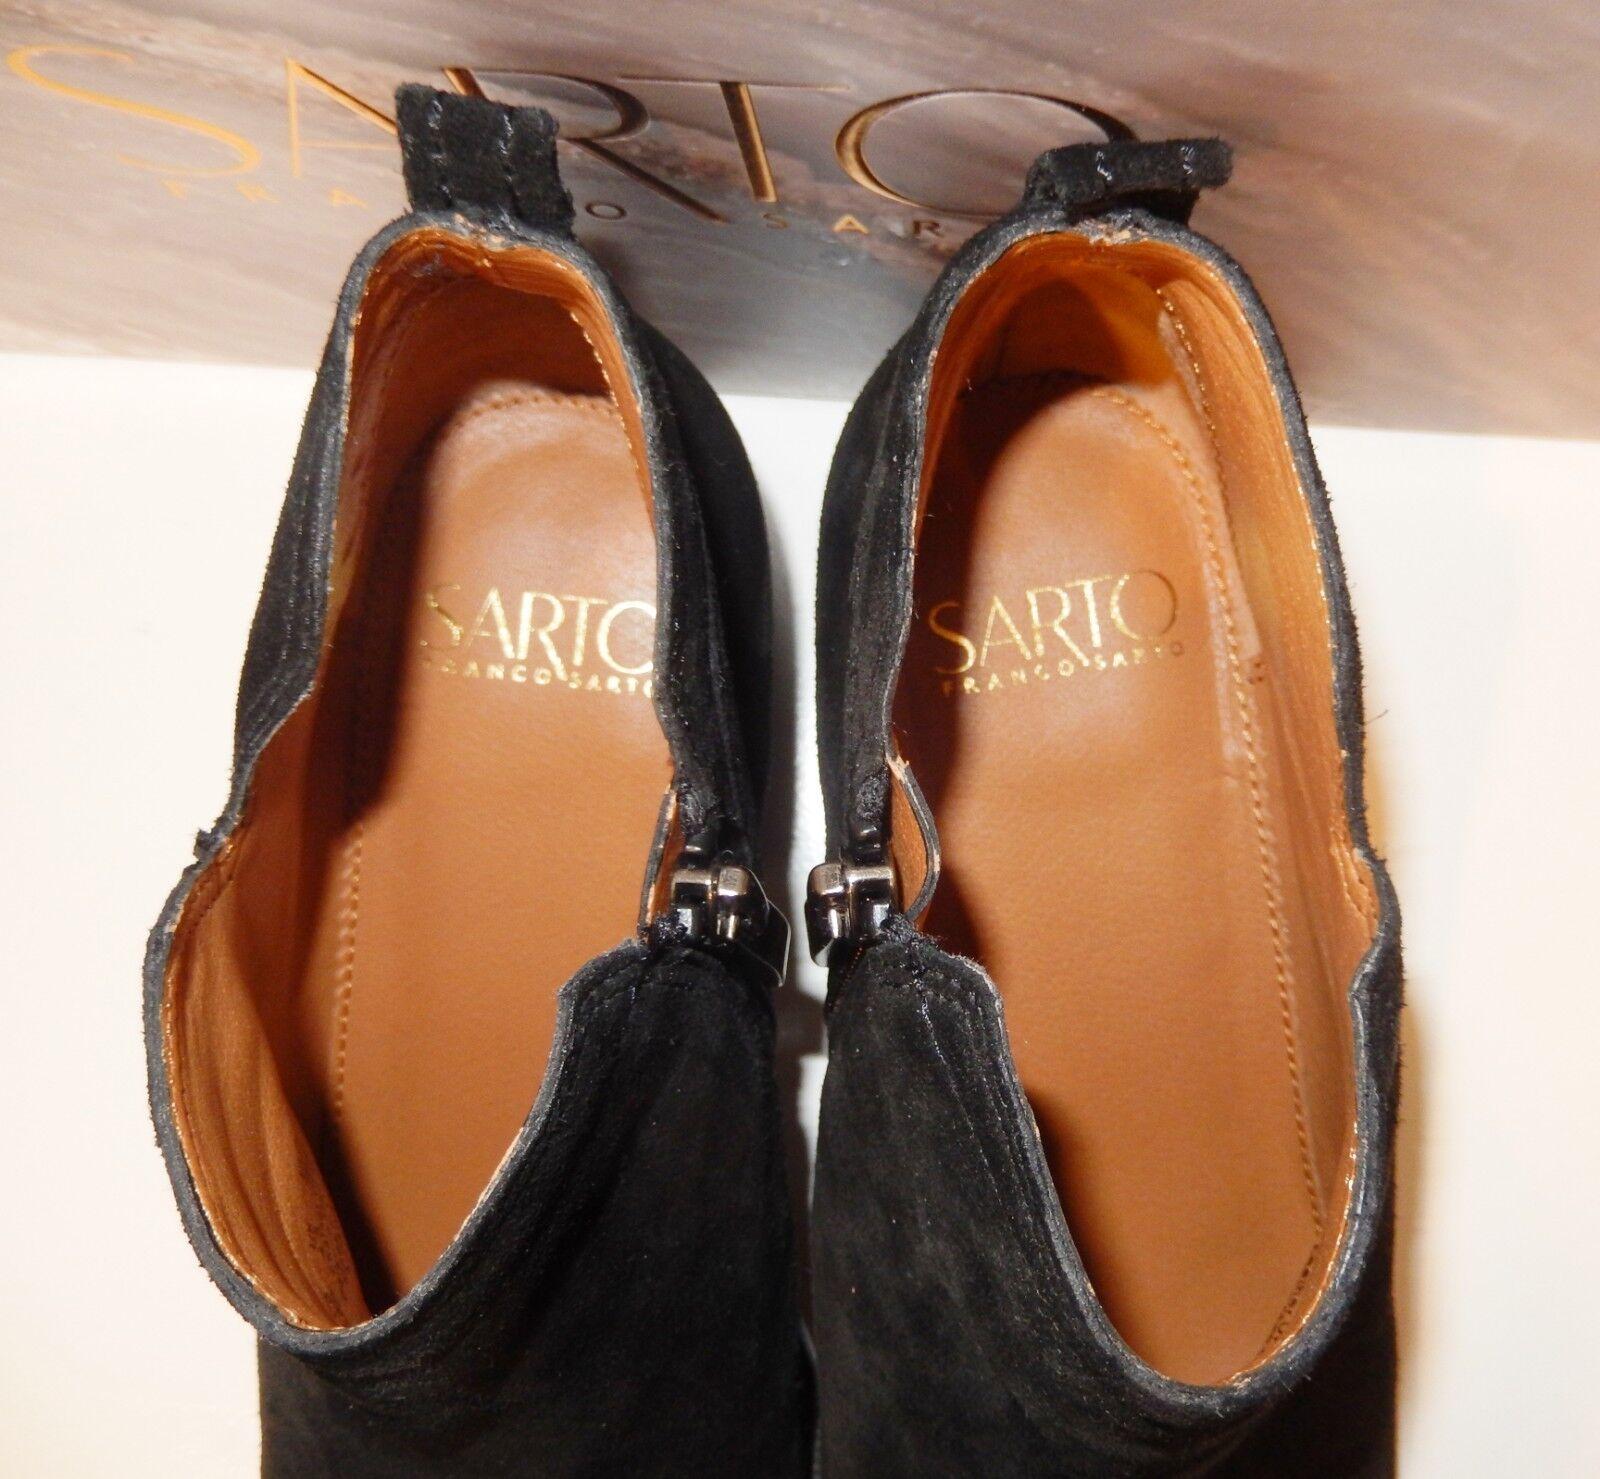 SARTO Franco Sarto  129 129 129 PAIVLEY Inner Side Zips Suede Booties Black Sz. 6 1 2 W 1a87f9